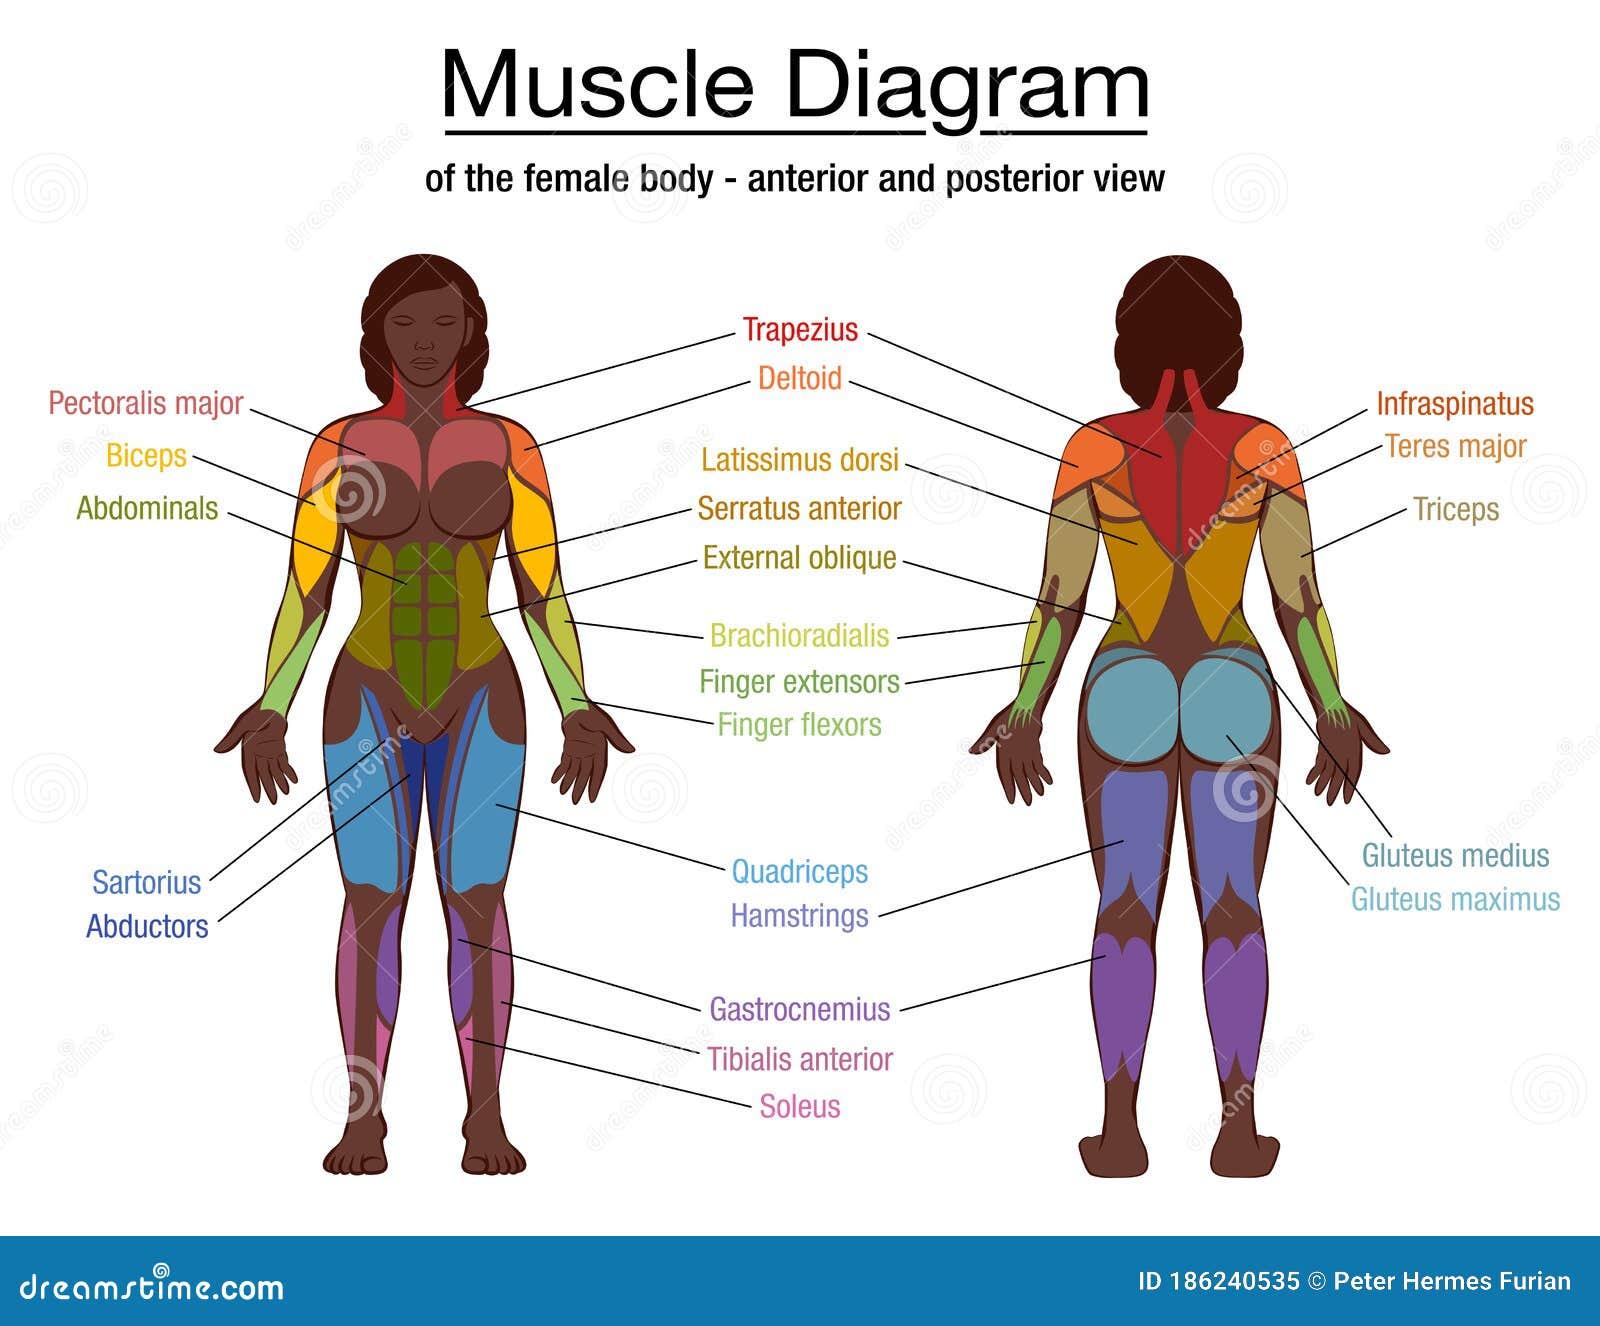 Muscle Diagram Black Woman Female Body Names Stock Vector ...